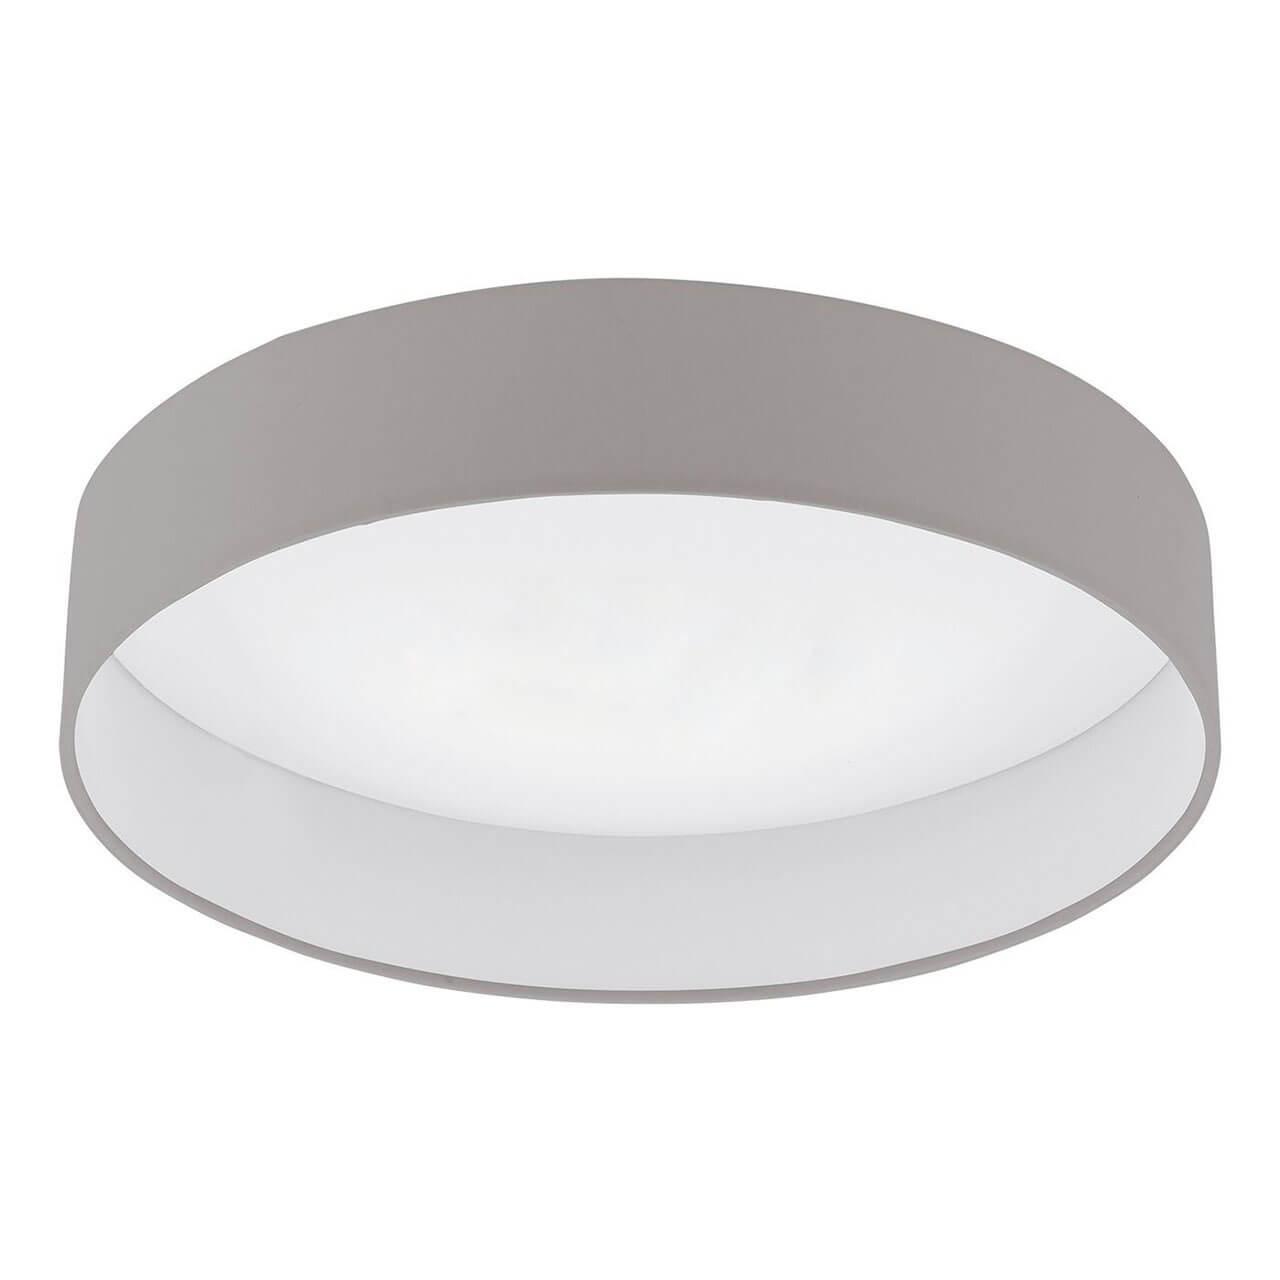 Накладной светильник Eglo 96539, LED, 18 Вт цена